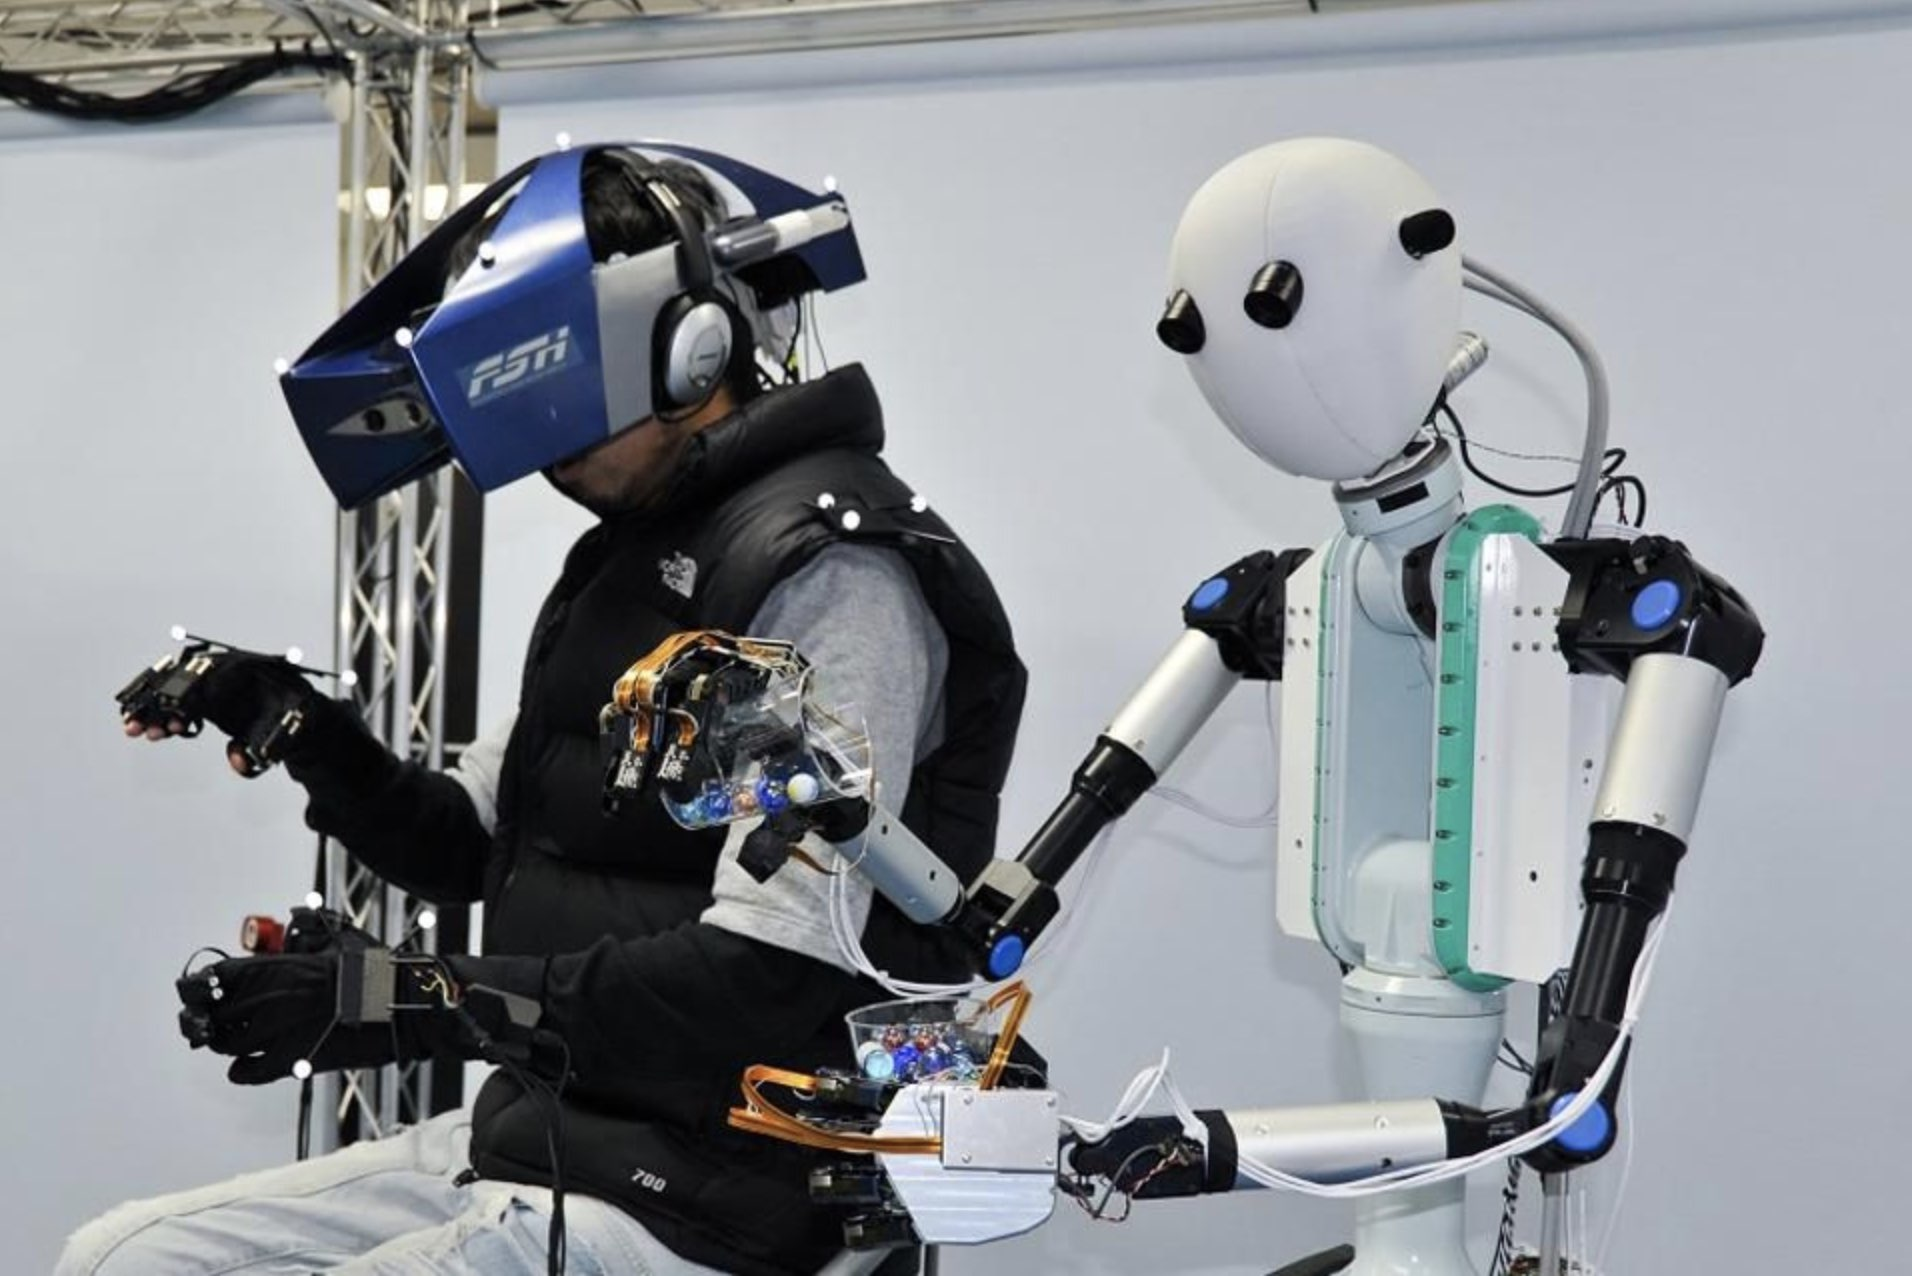 Telexistence: Control a long distance Robot Avatar using VR gear